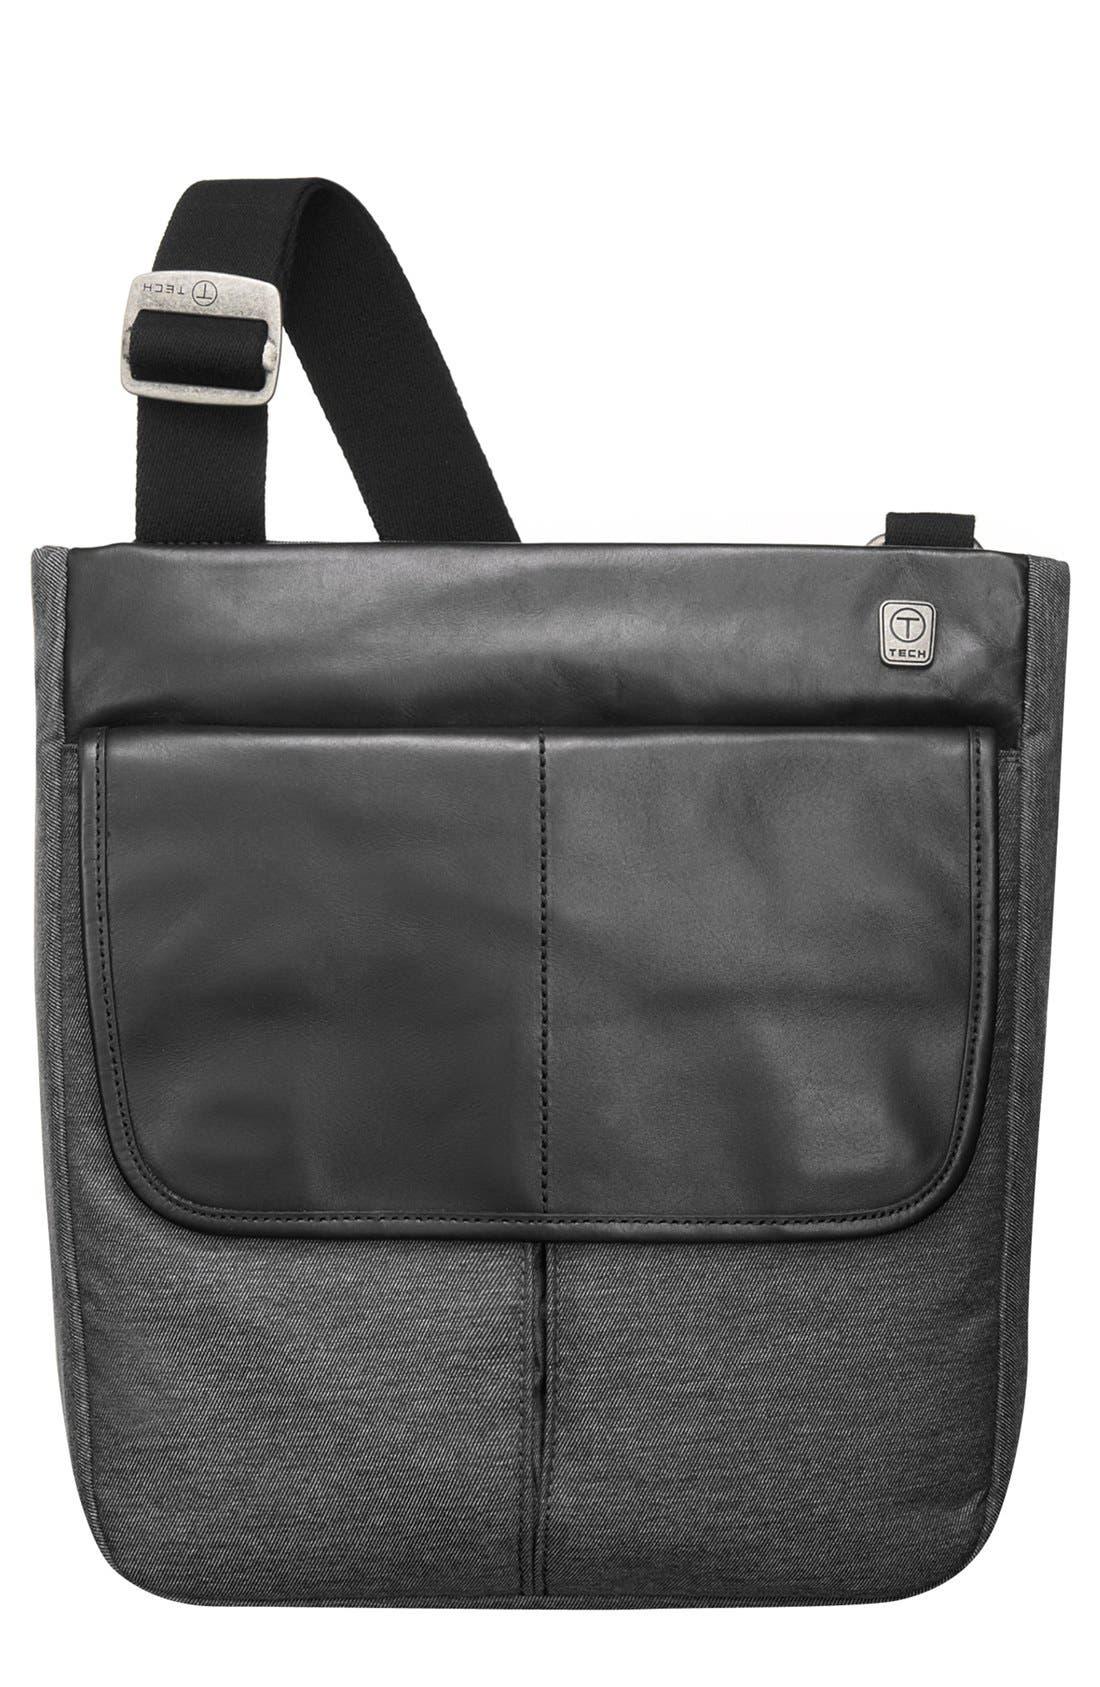 Main Image - T-Tech by Tumi 'Forge - Pueblo' Top Zip Flap Bag